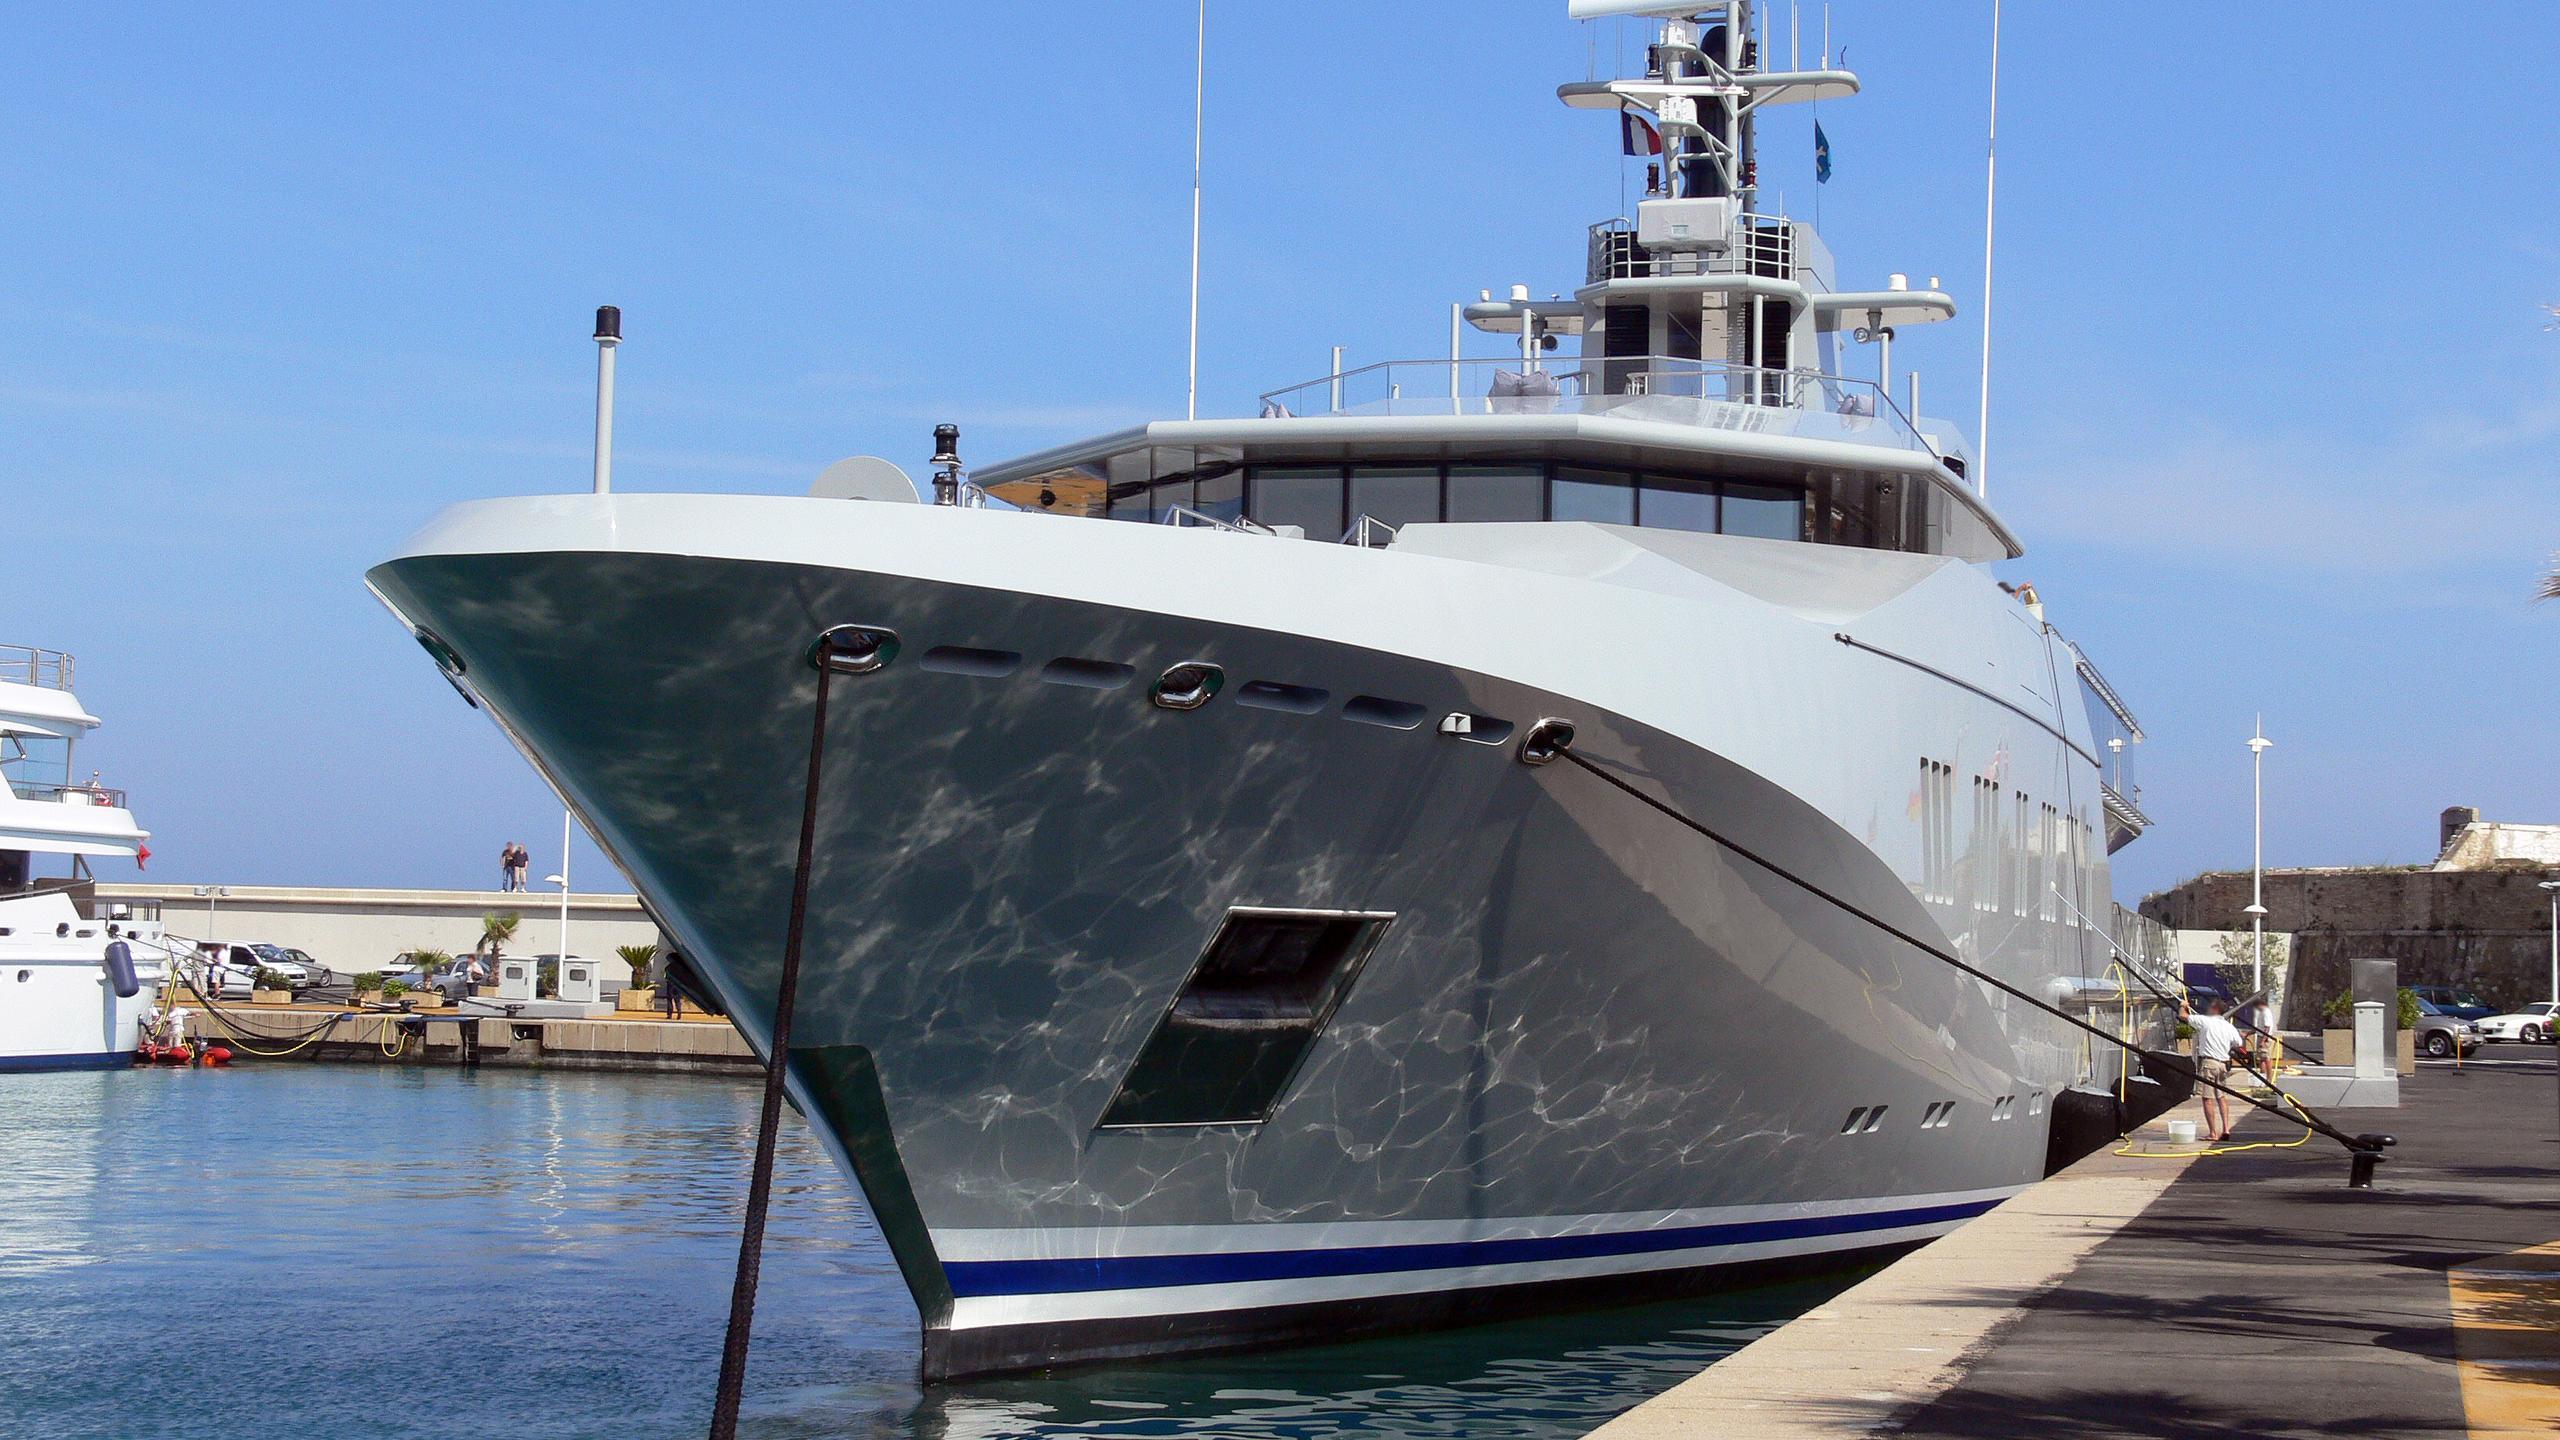 skat-explorer-yacht-lurssen-2002-71m-bow